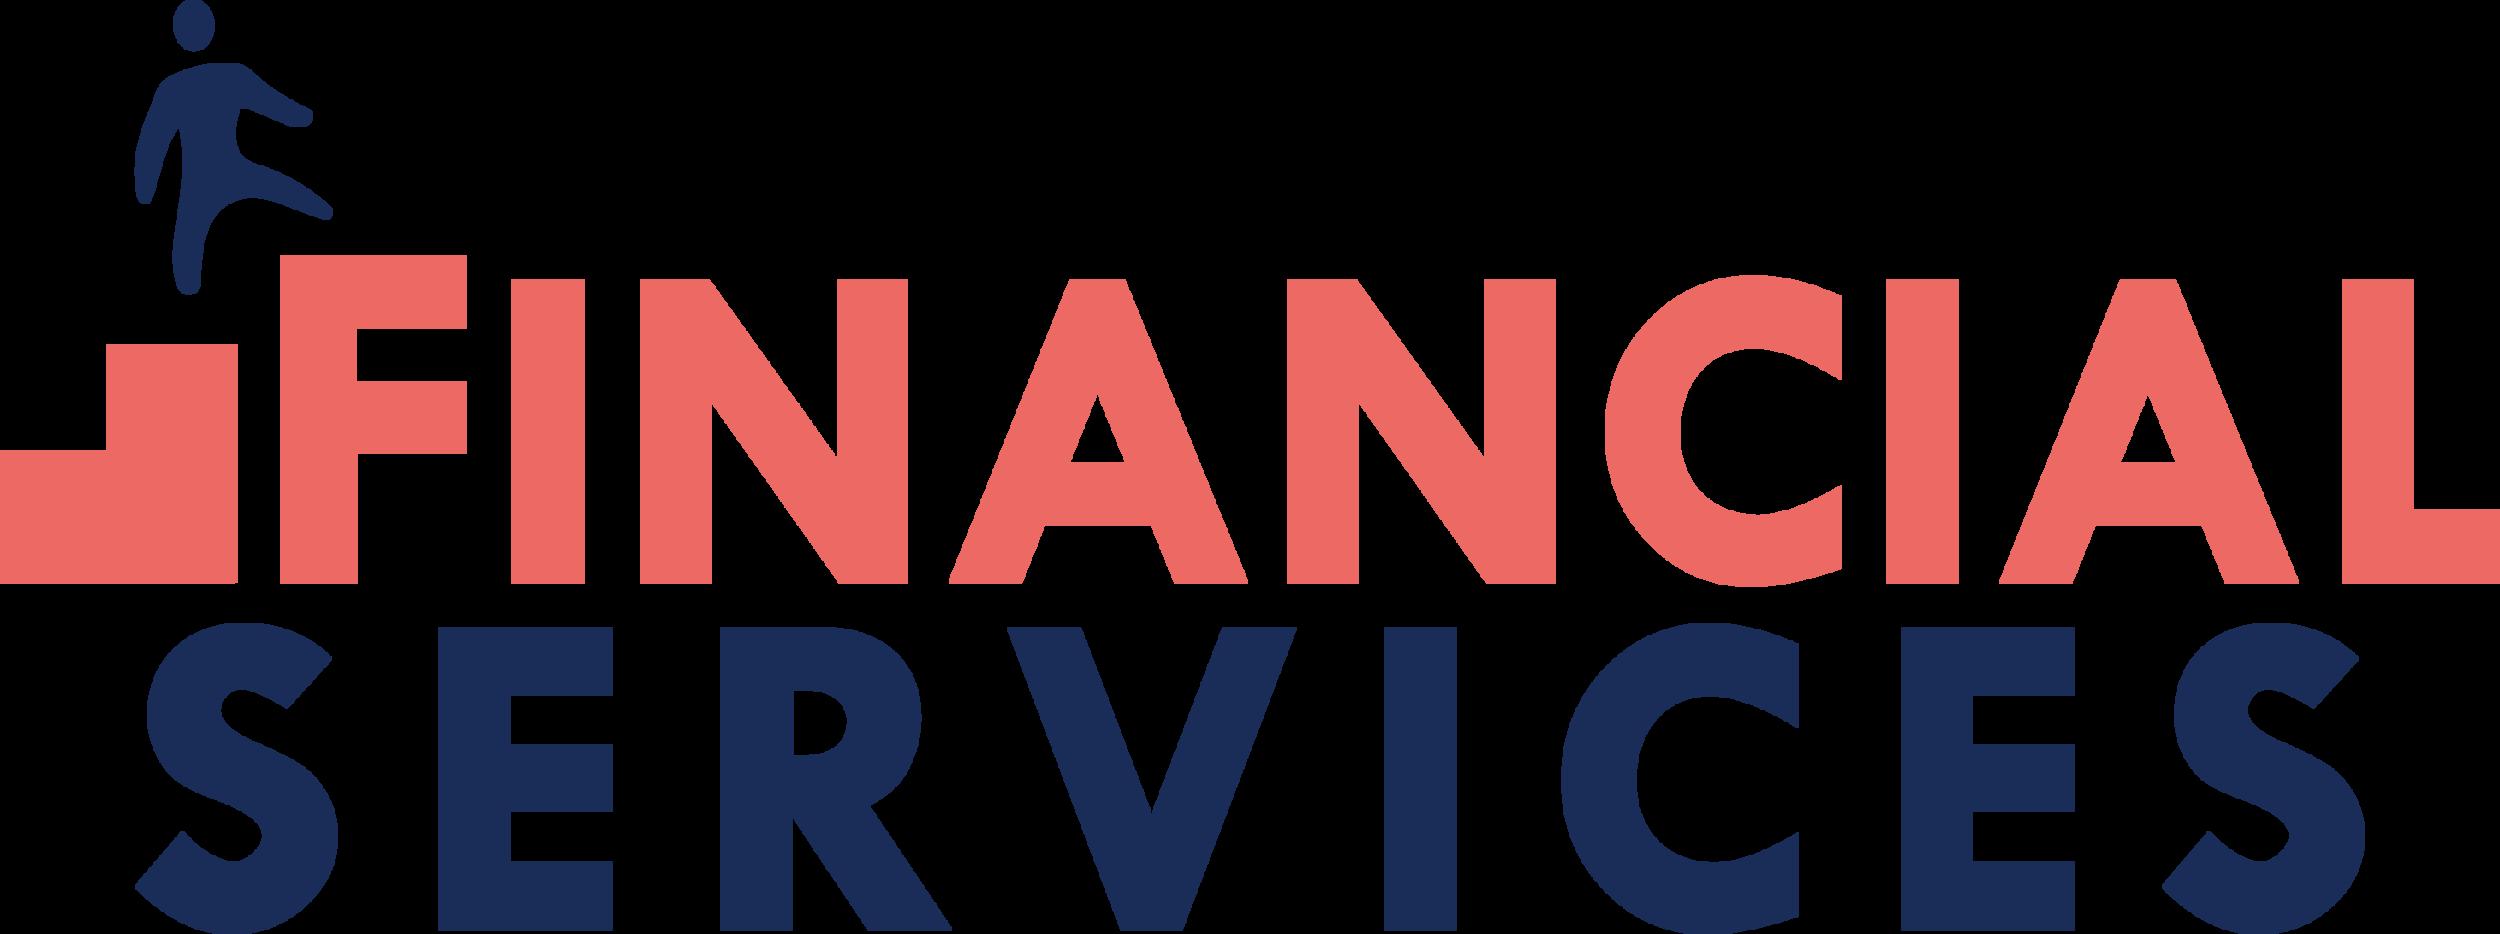 finacial_services.png